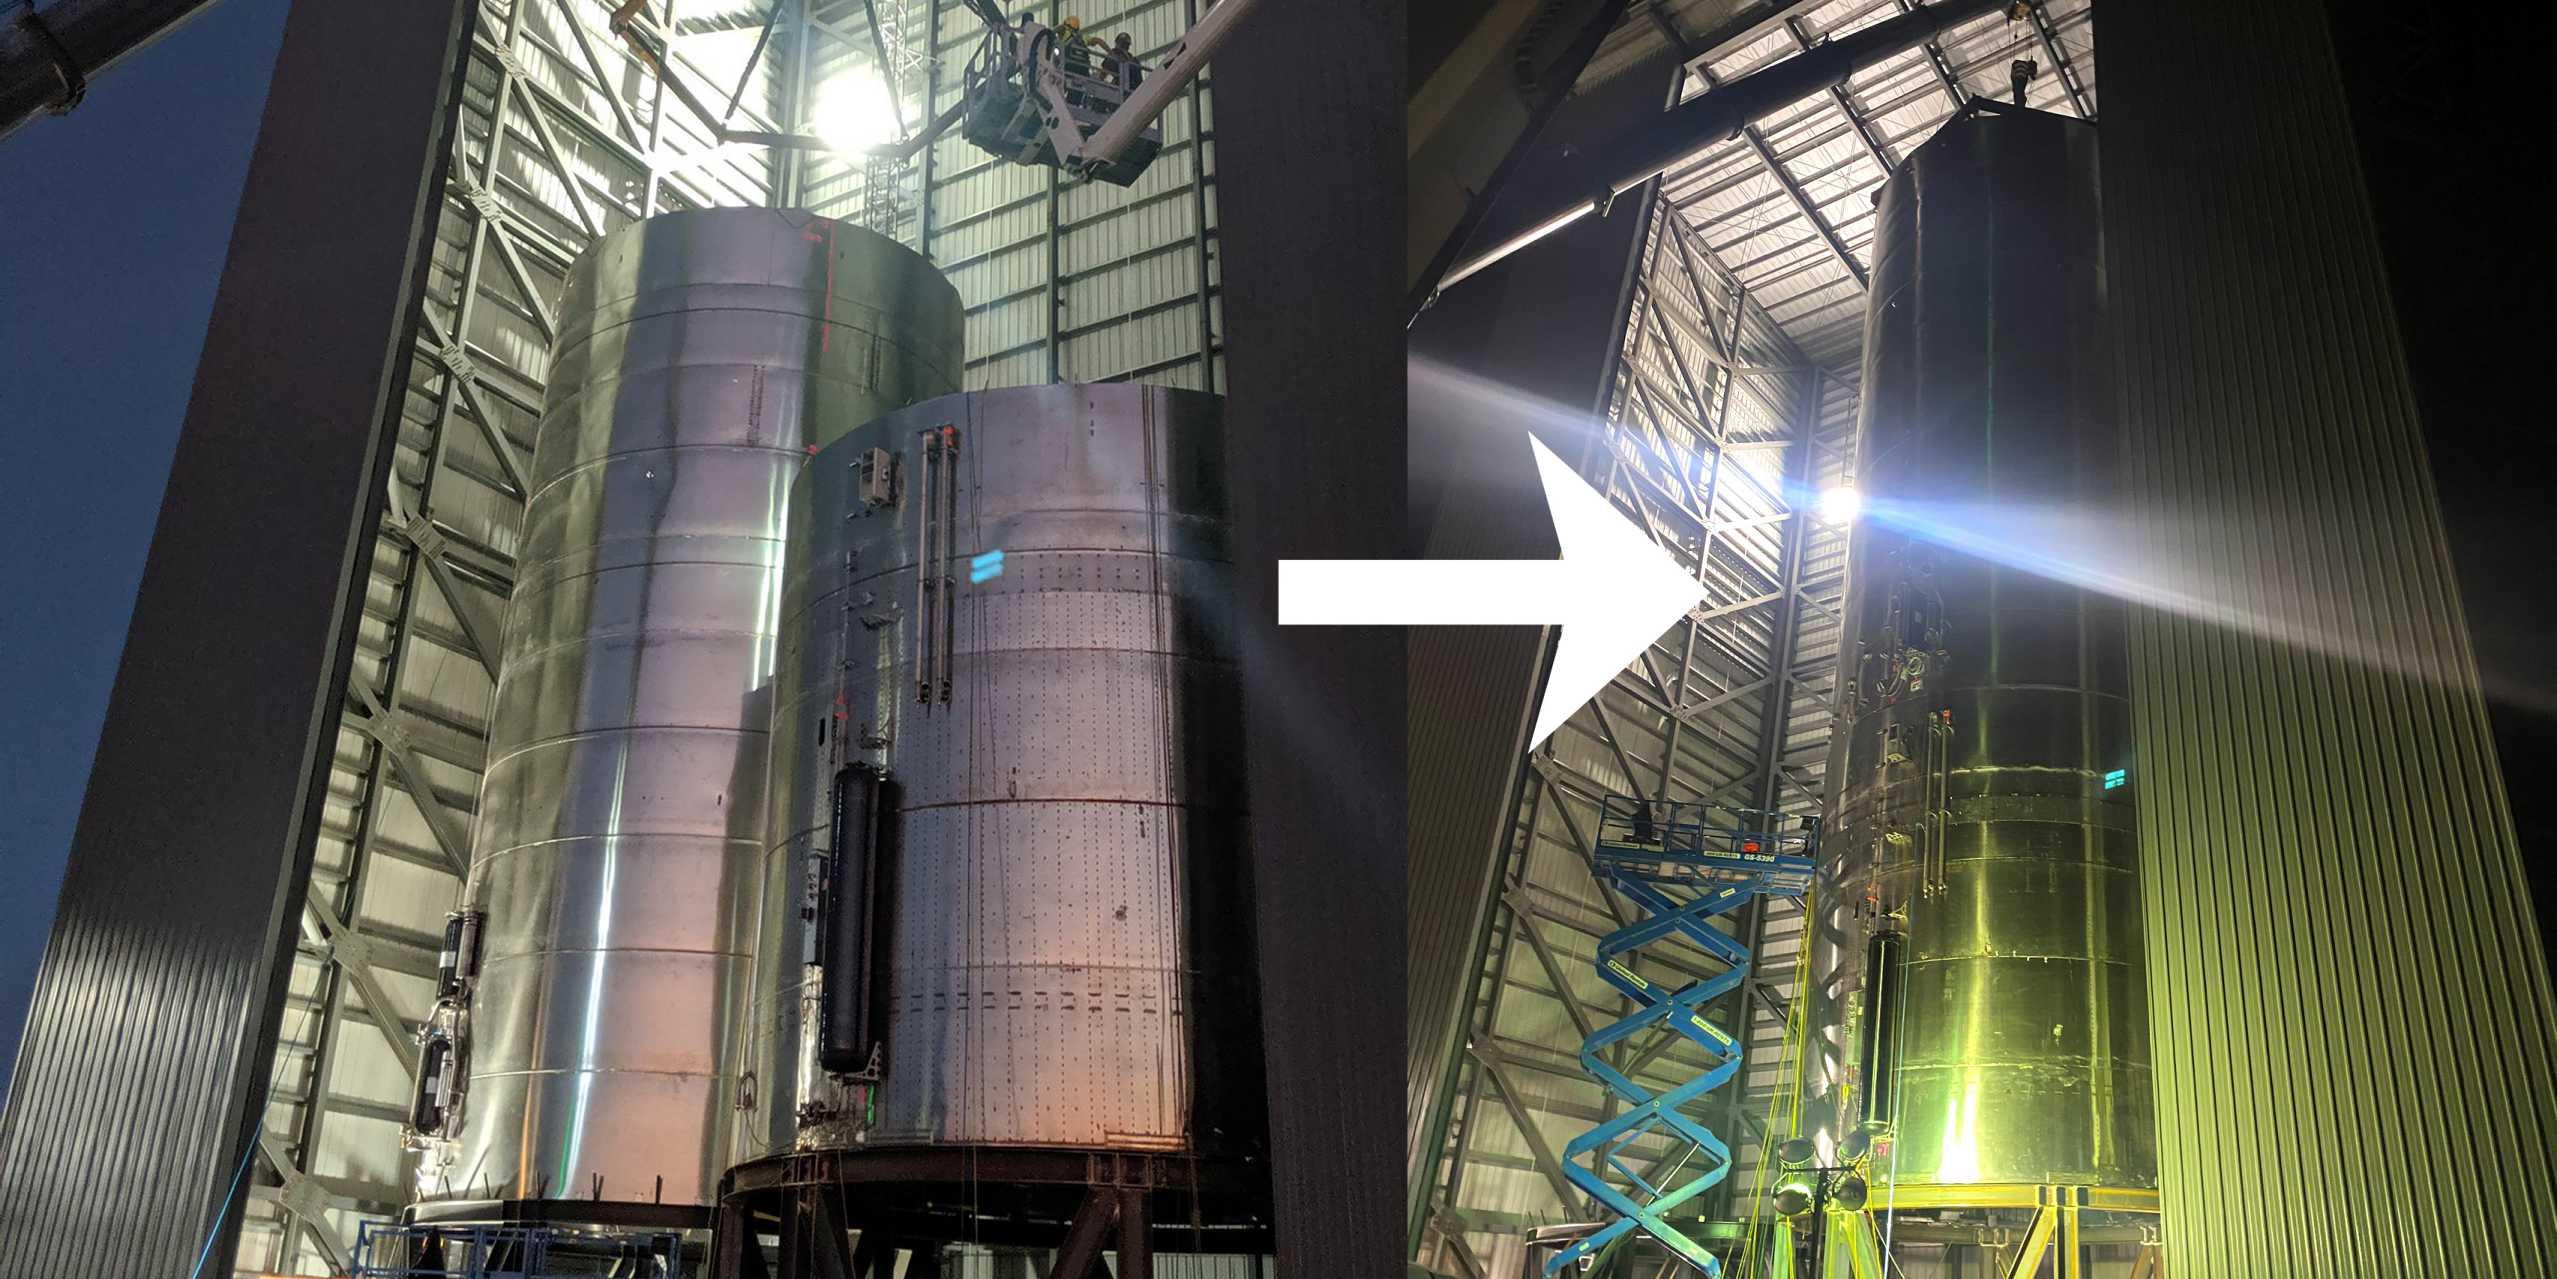 Starship SN3 tank section final stacking 032620 (Elon Musk) panel 1 arrow (c)